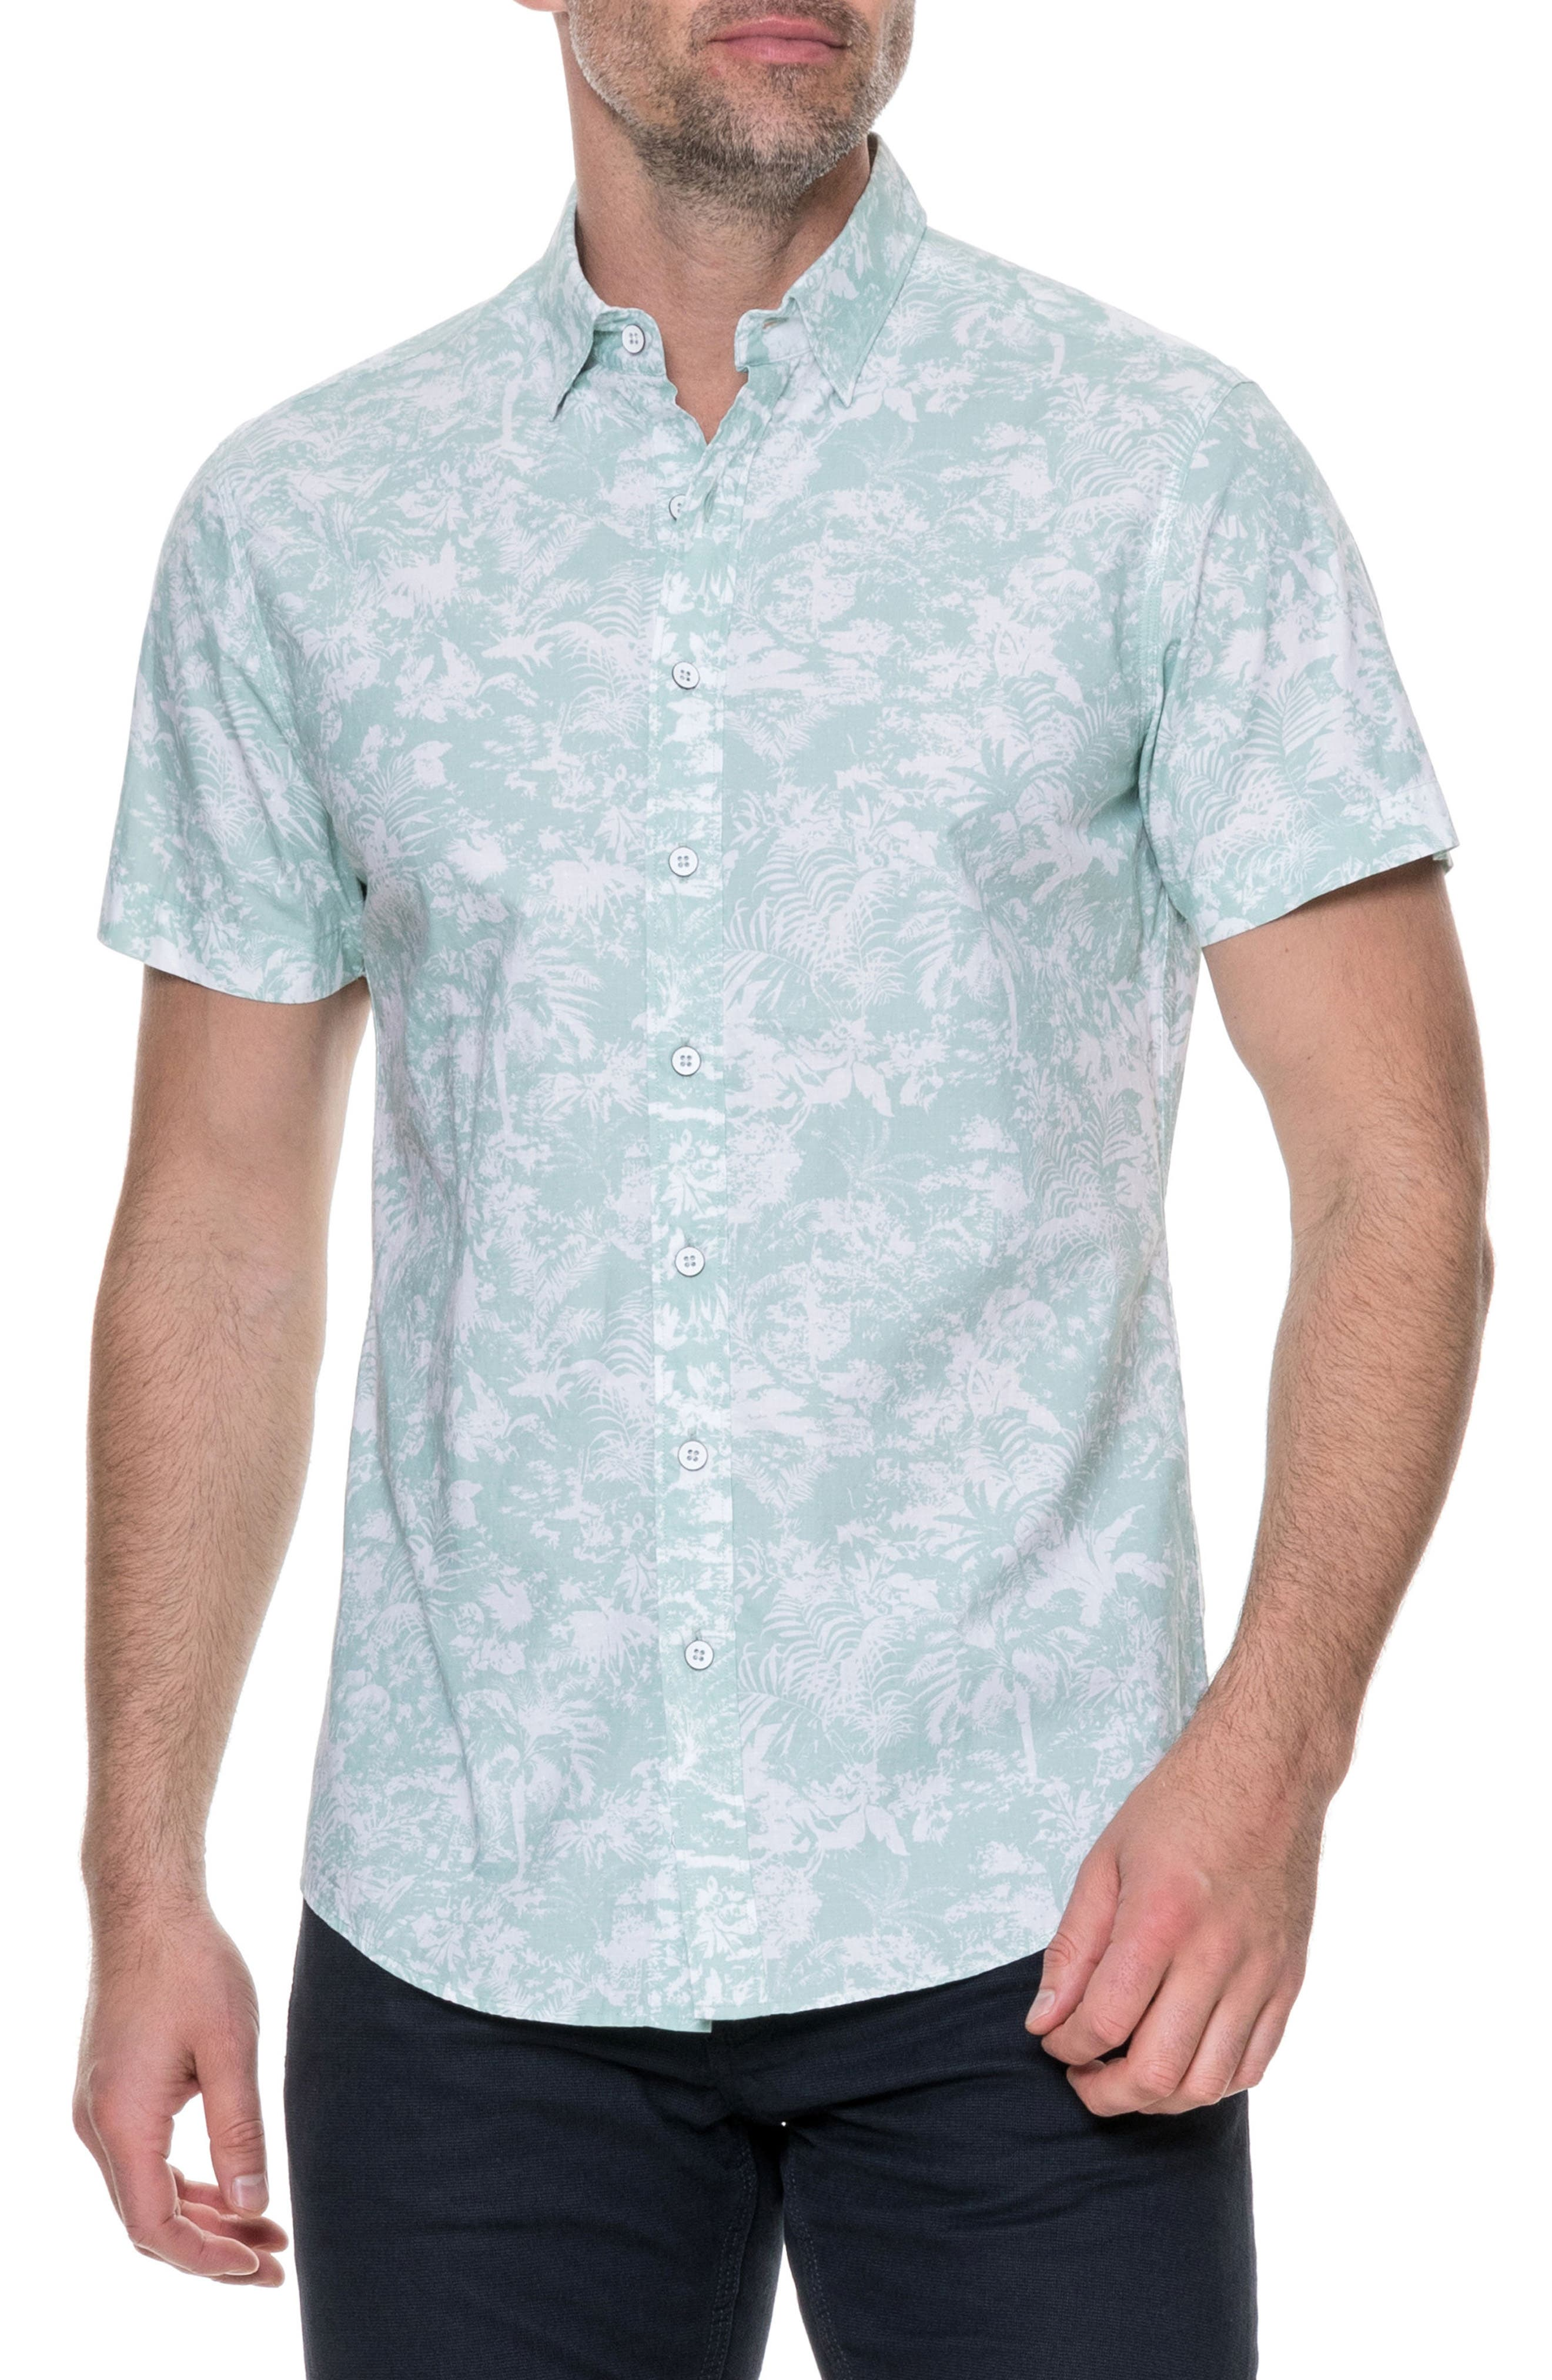 RODD & GUNN Redcastle Regular Fit Sport Shirt, Main, color, POWDER BLUE